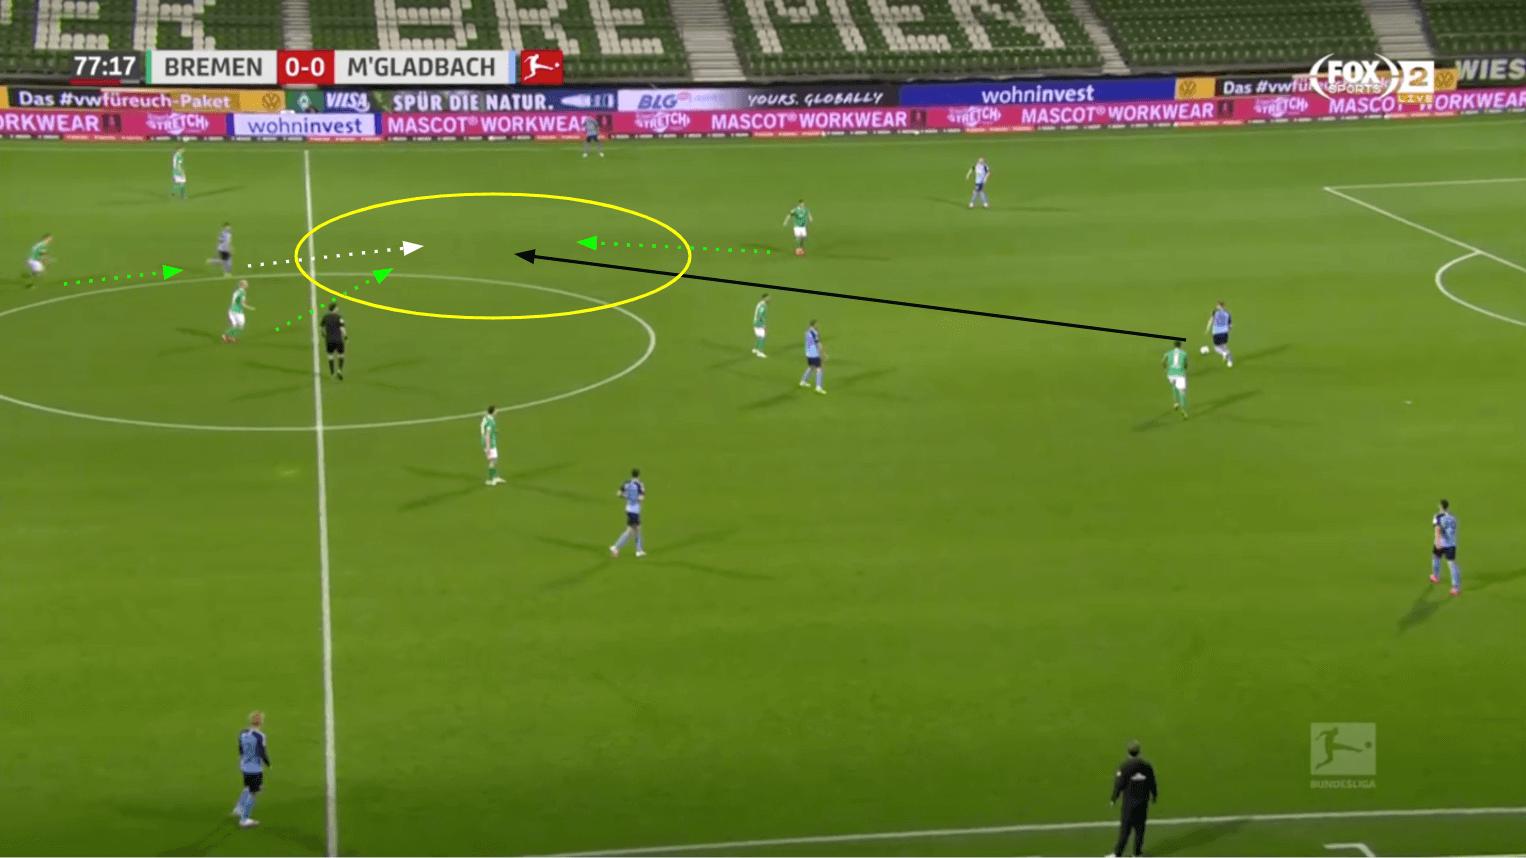 Bundesliga 2019/20: Werder Bremen vs Borussia Monchengladbach - tactical analysis tactics